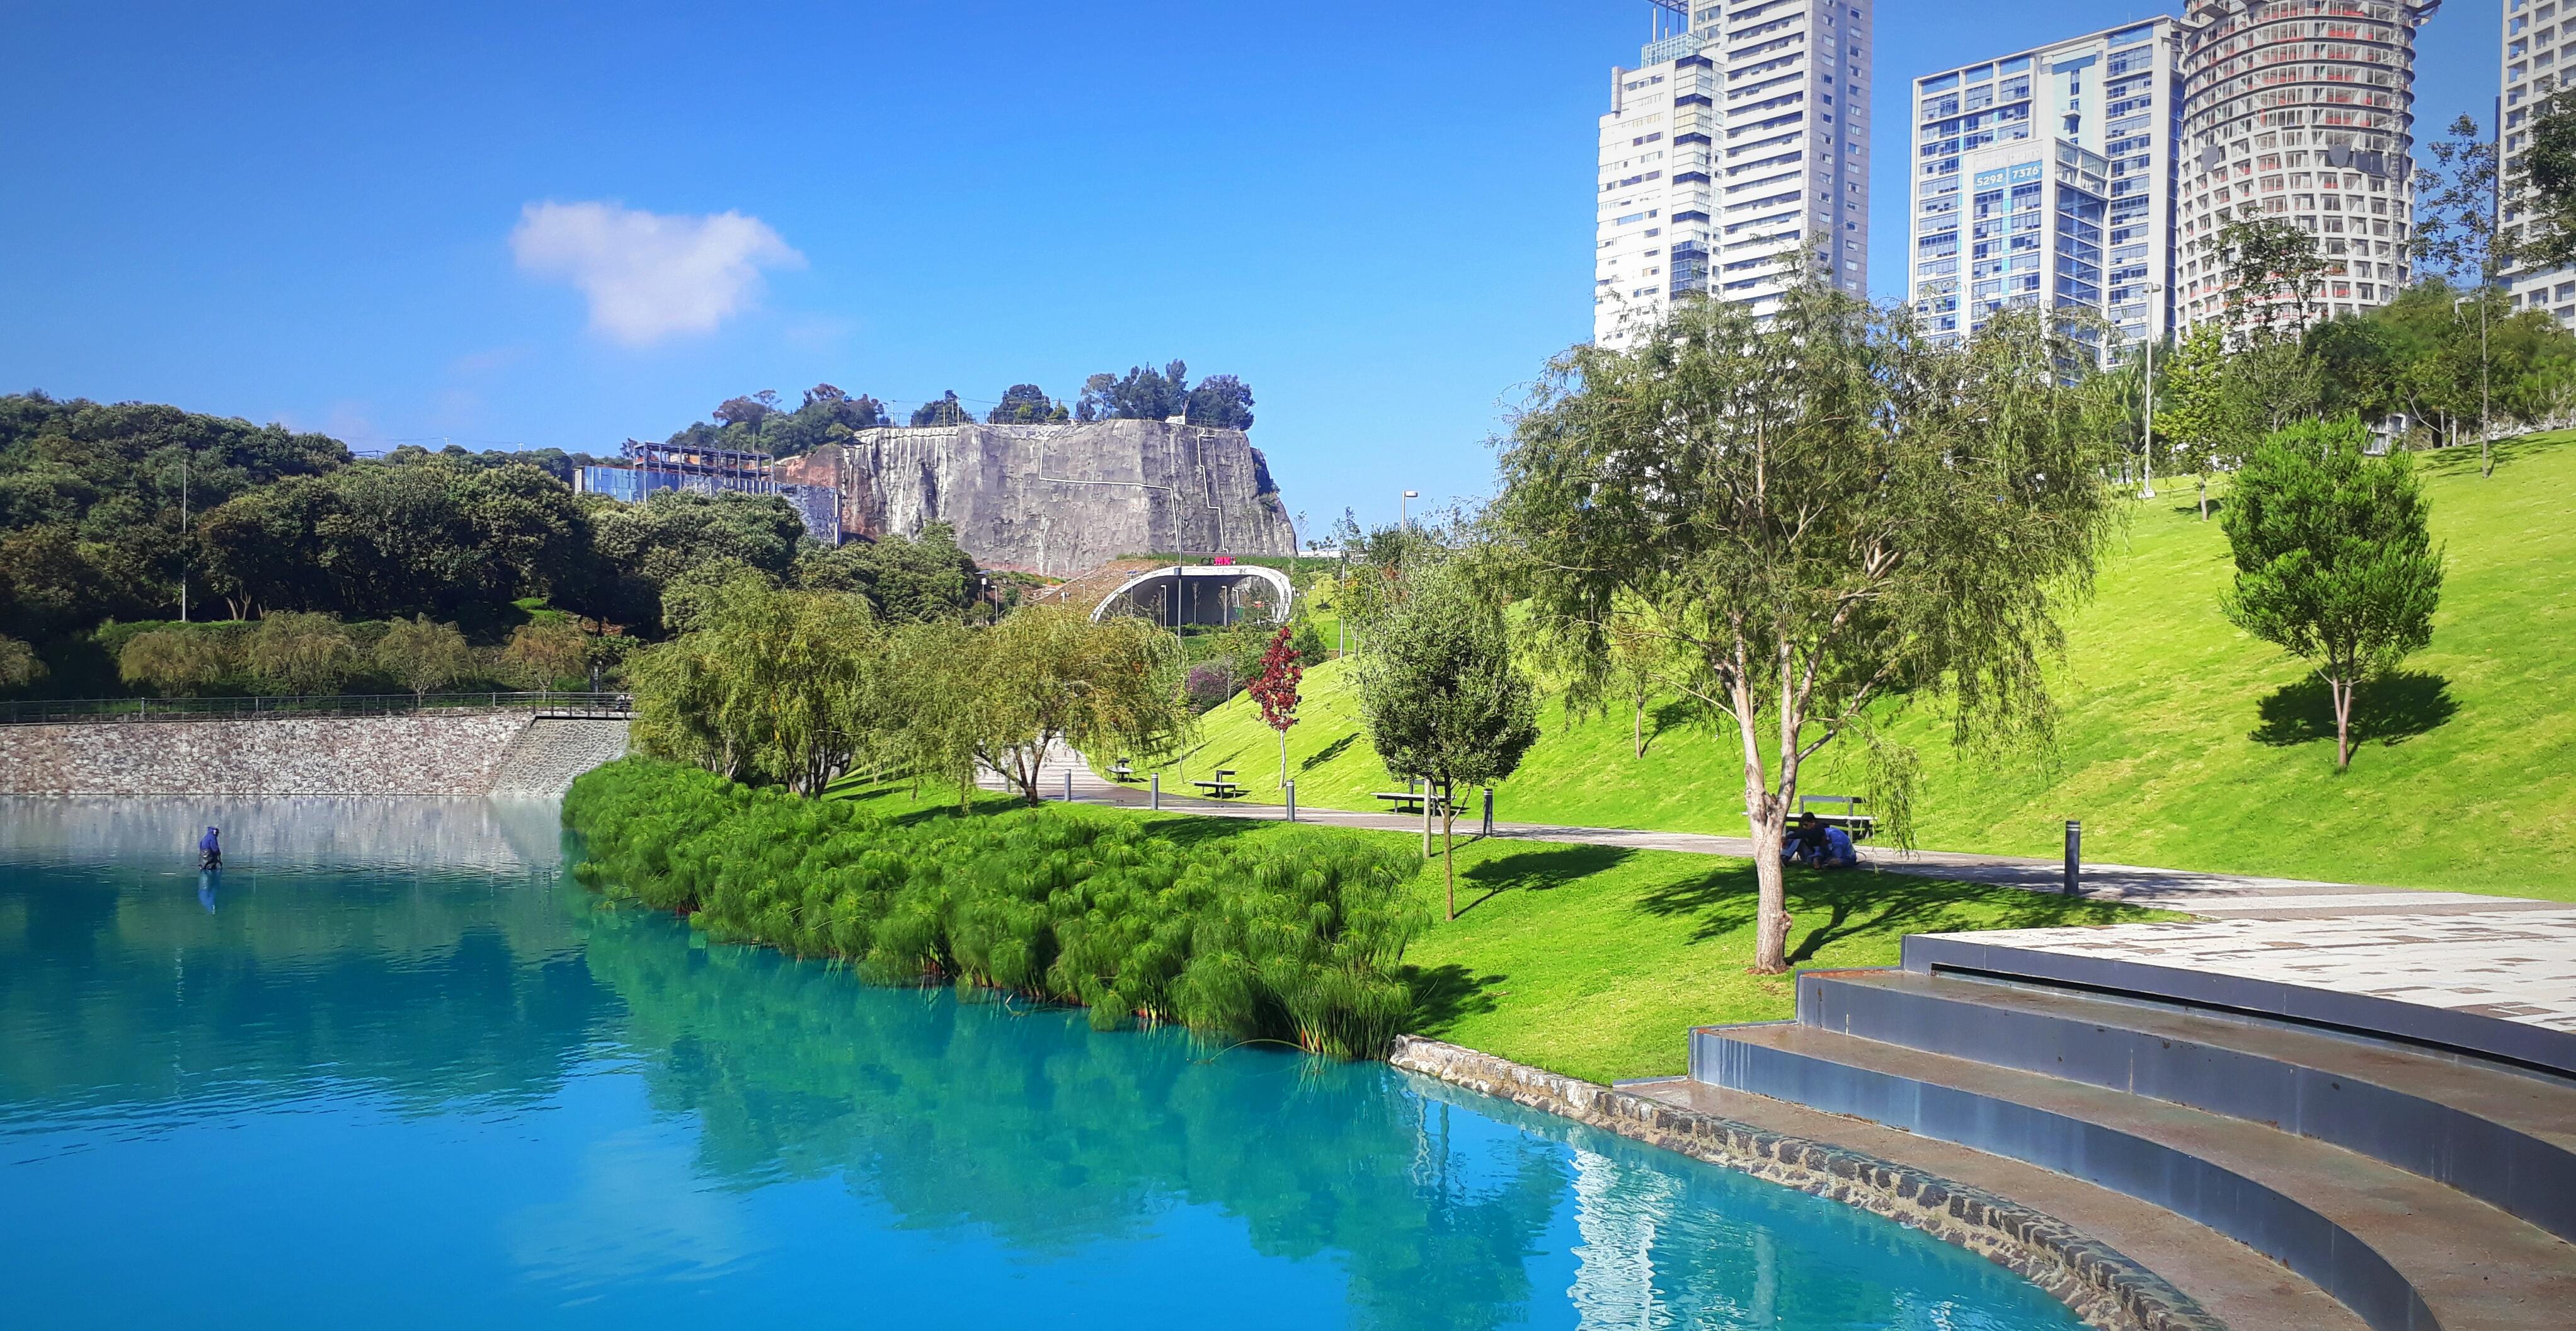 Parque La Mexicana - Wikipedia, la enciclopedia libre